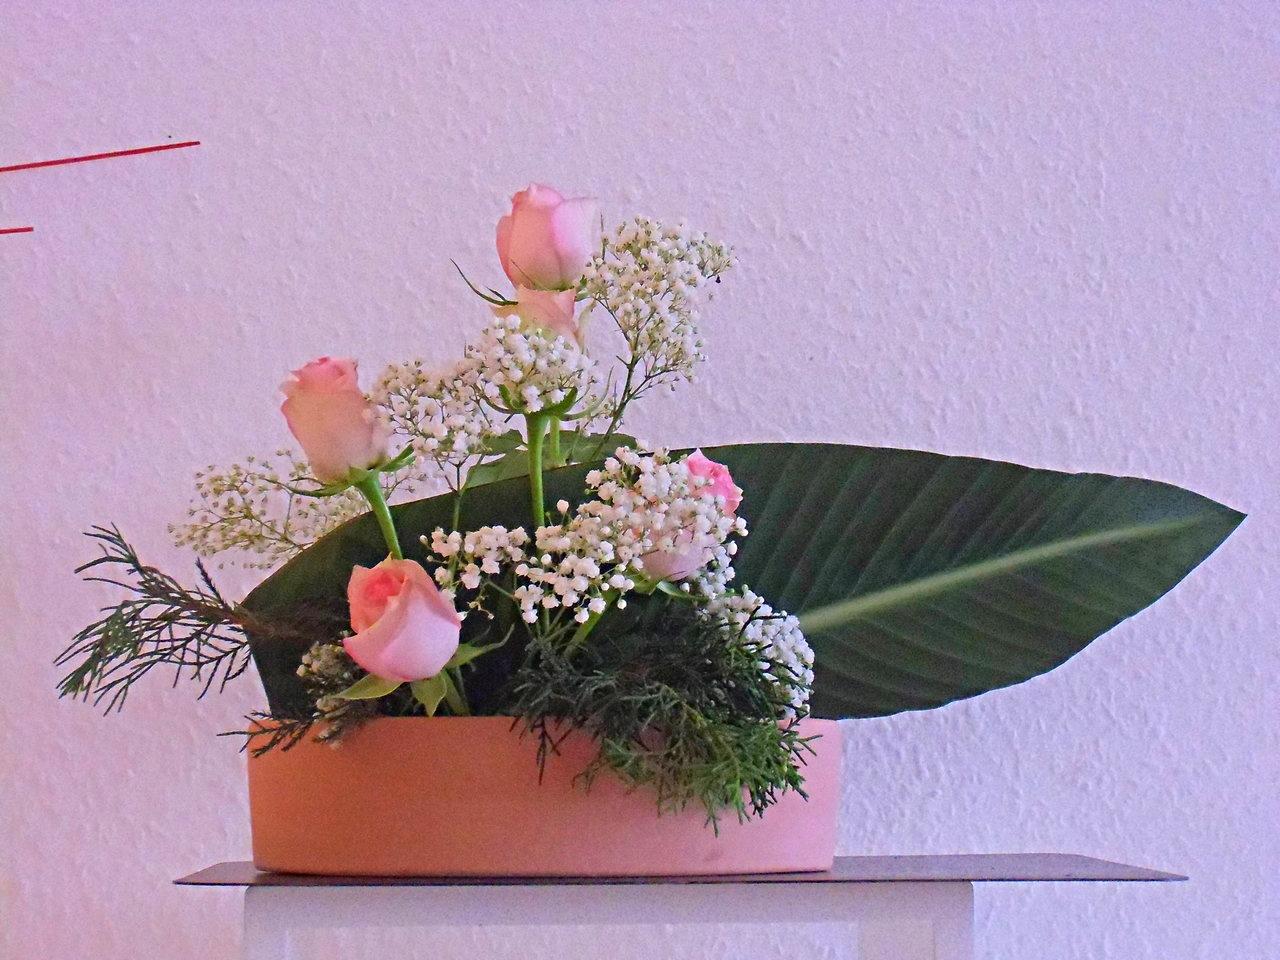 Moribana mit Strelitzienblatt